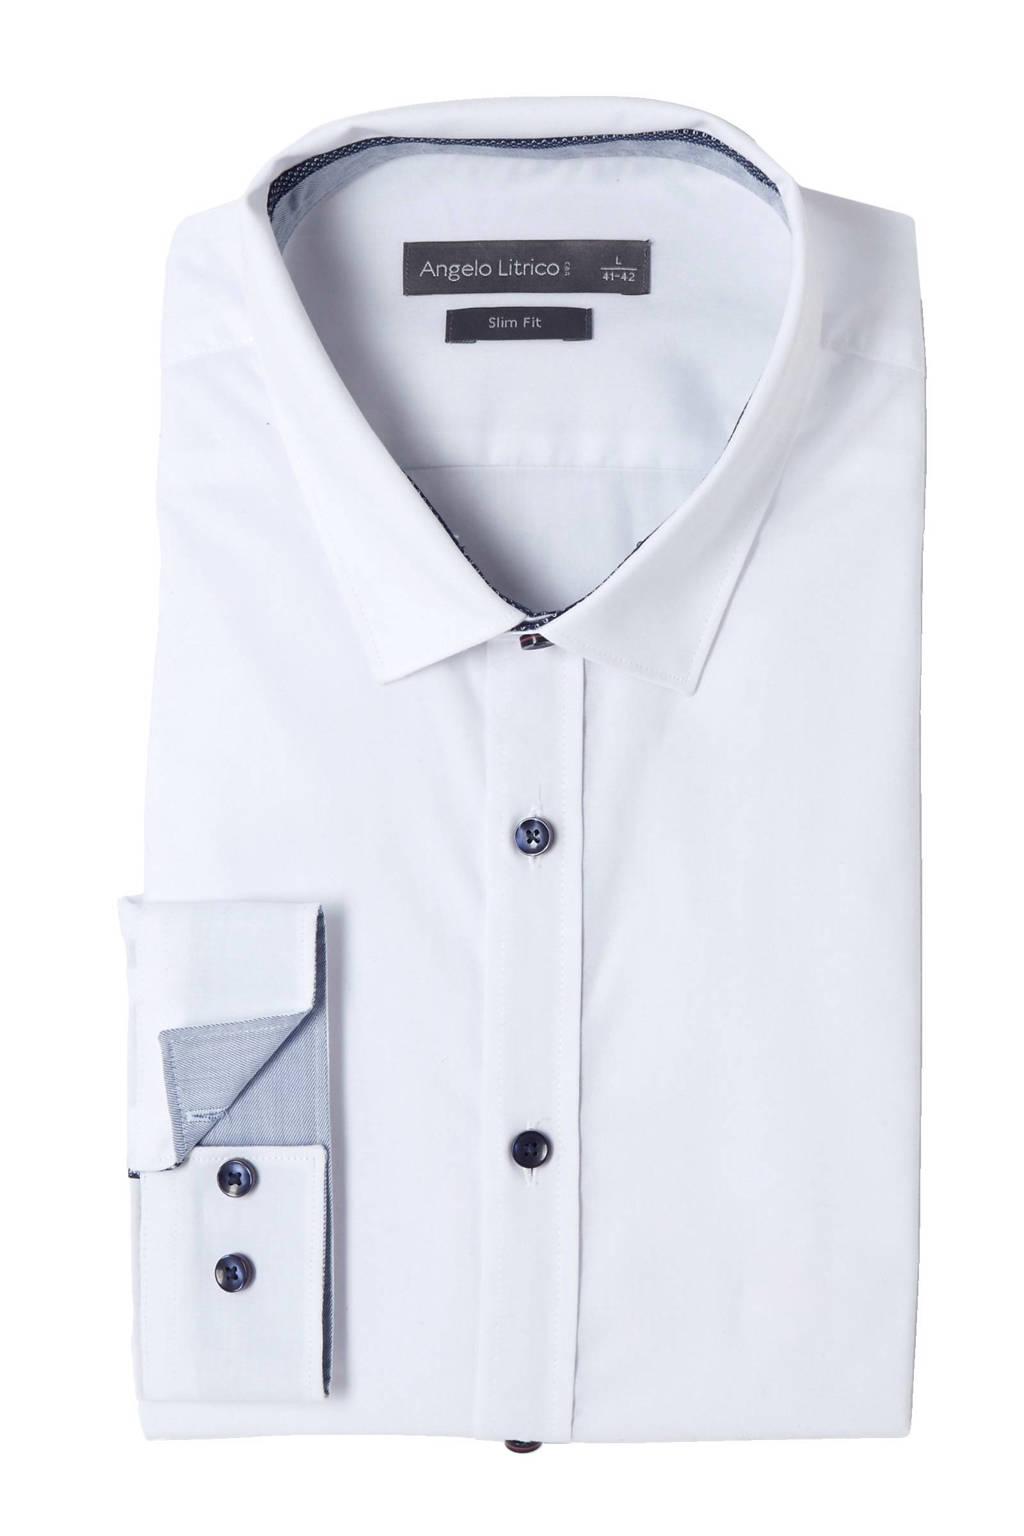 Overhemd Wit Slim Fit.C A Angelo Litrico Slim Fit Overhemd Wit Wehkamp